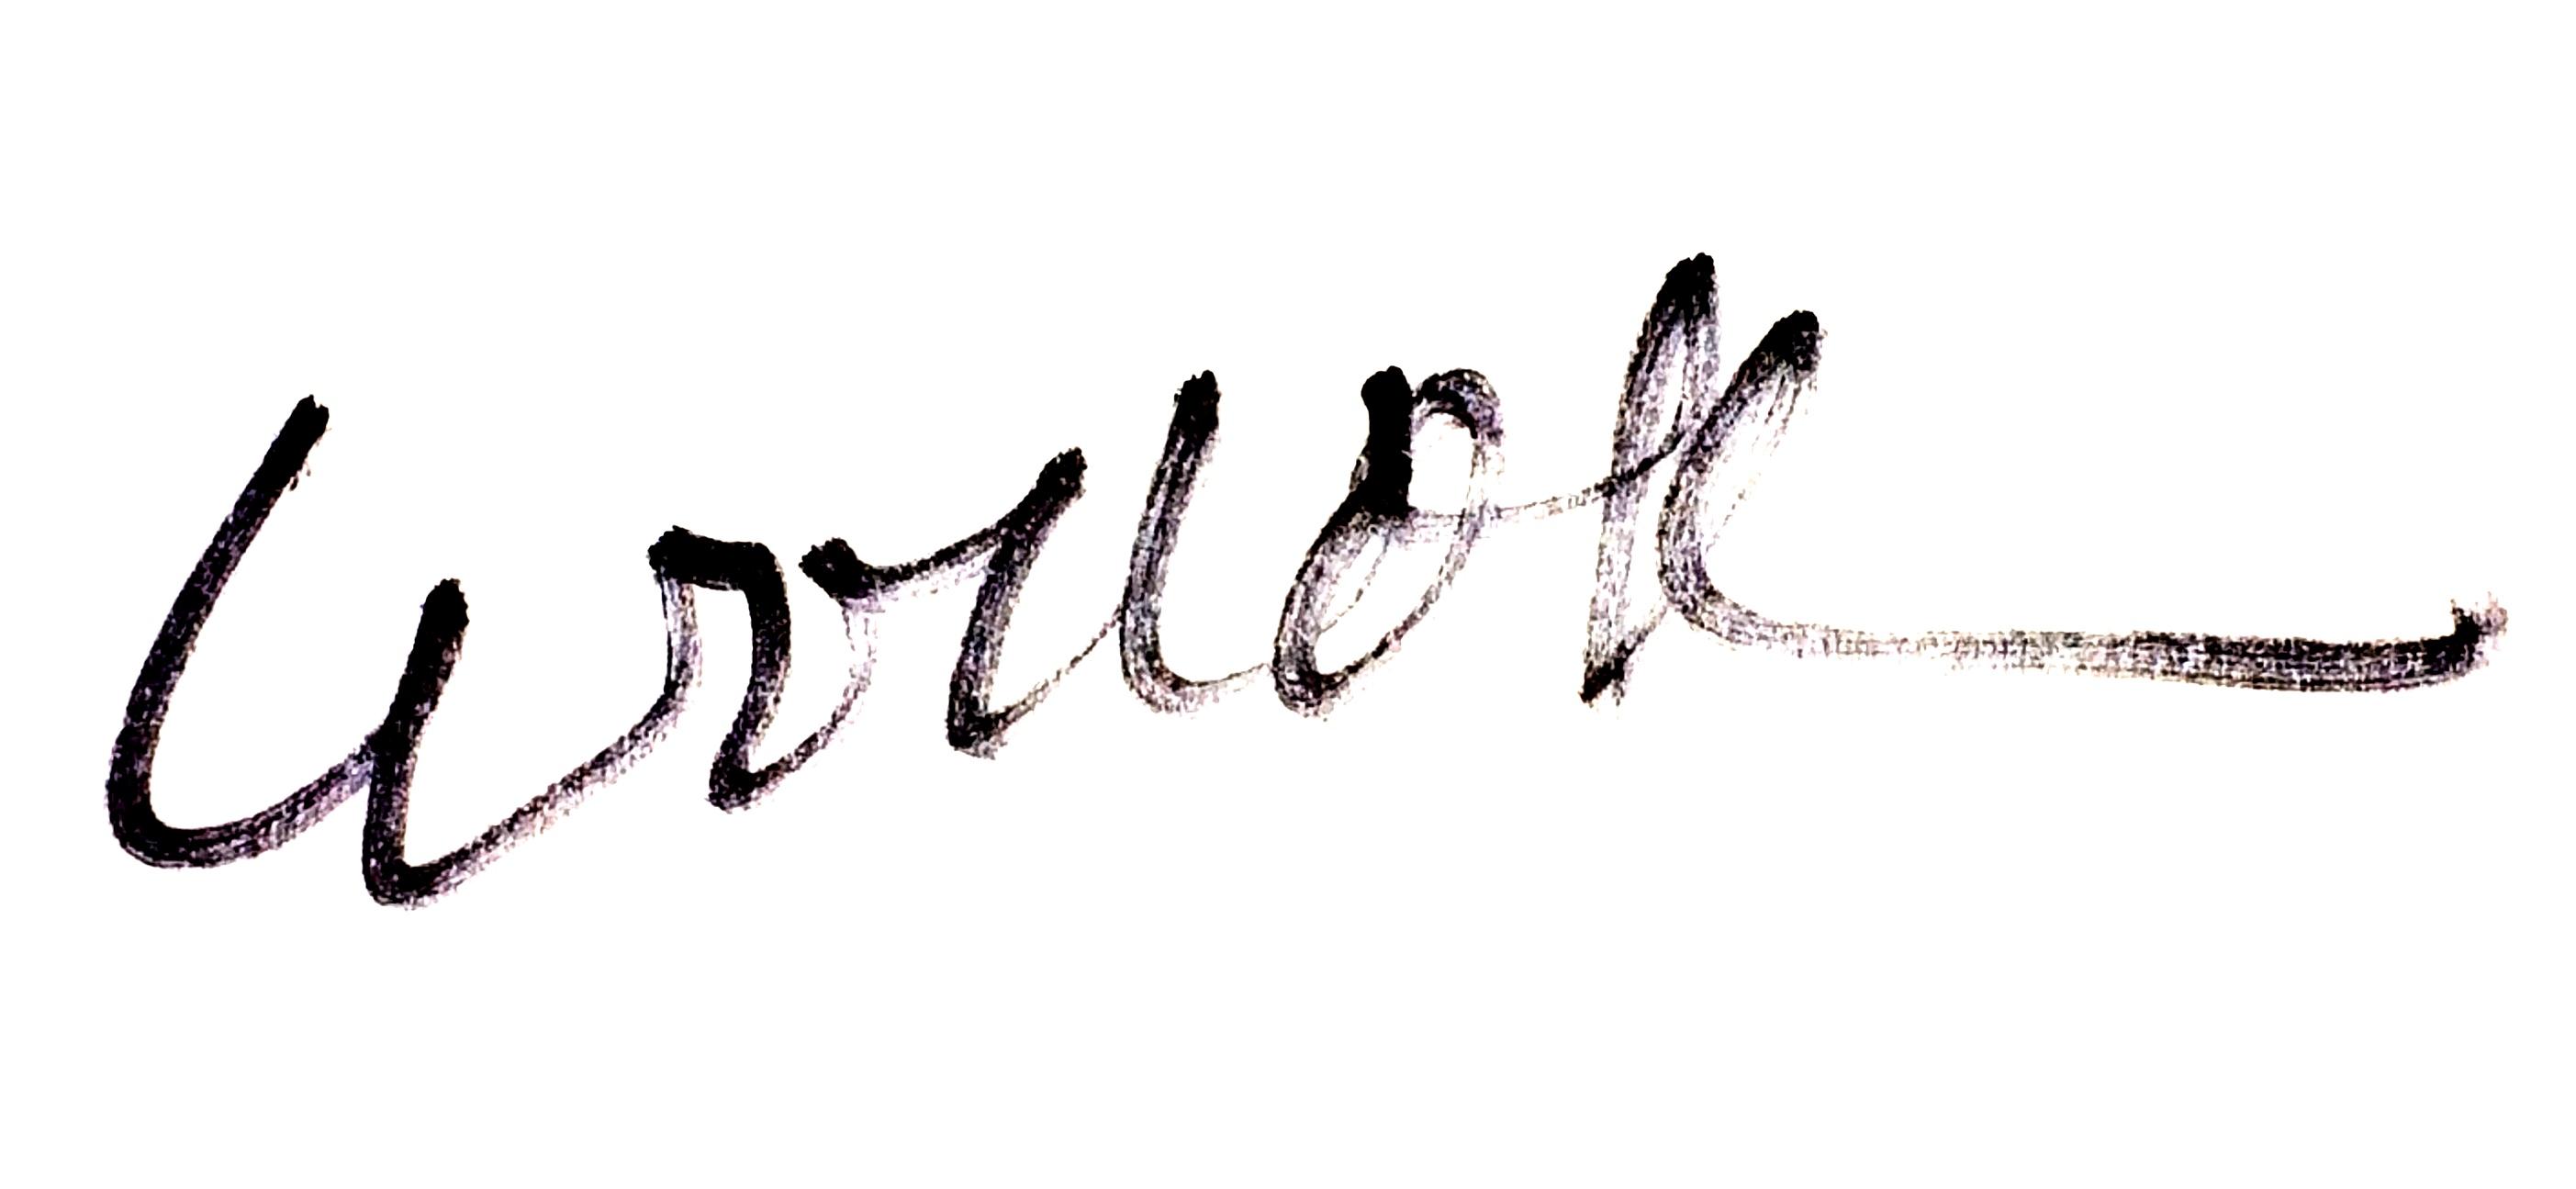 homoony's Signature